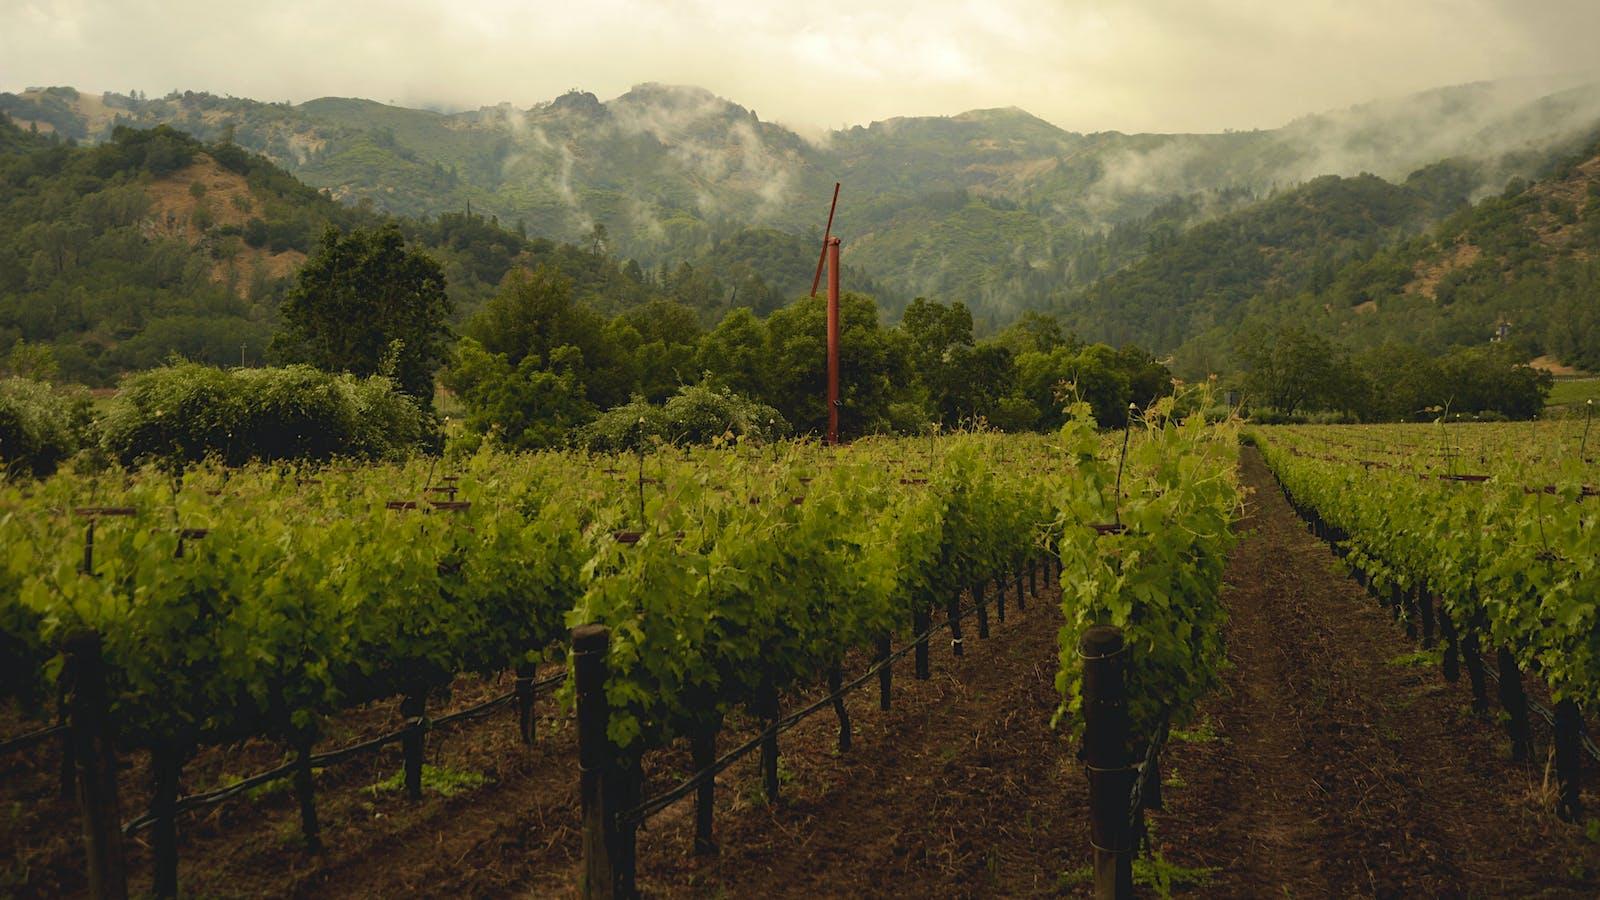 Serious <em>Grands Vins</em> on the Horizon from Eisele Vineyard